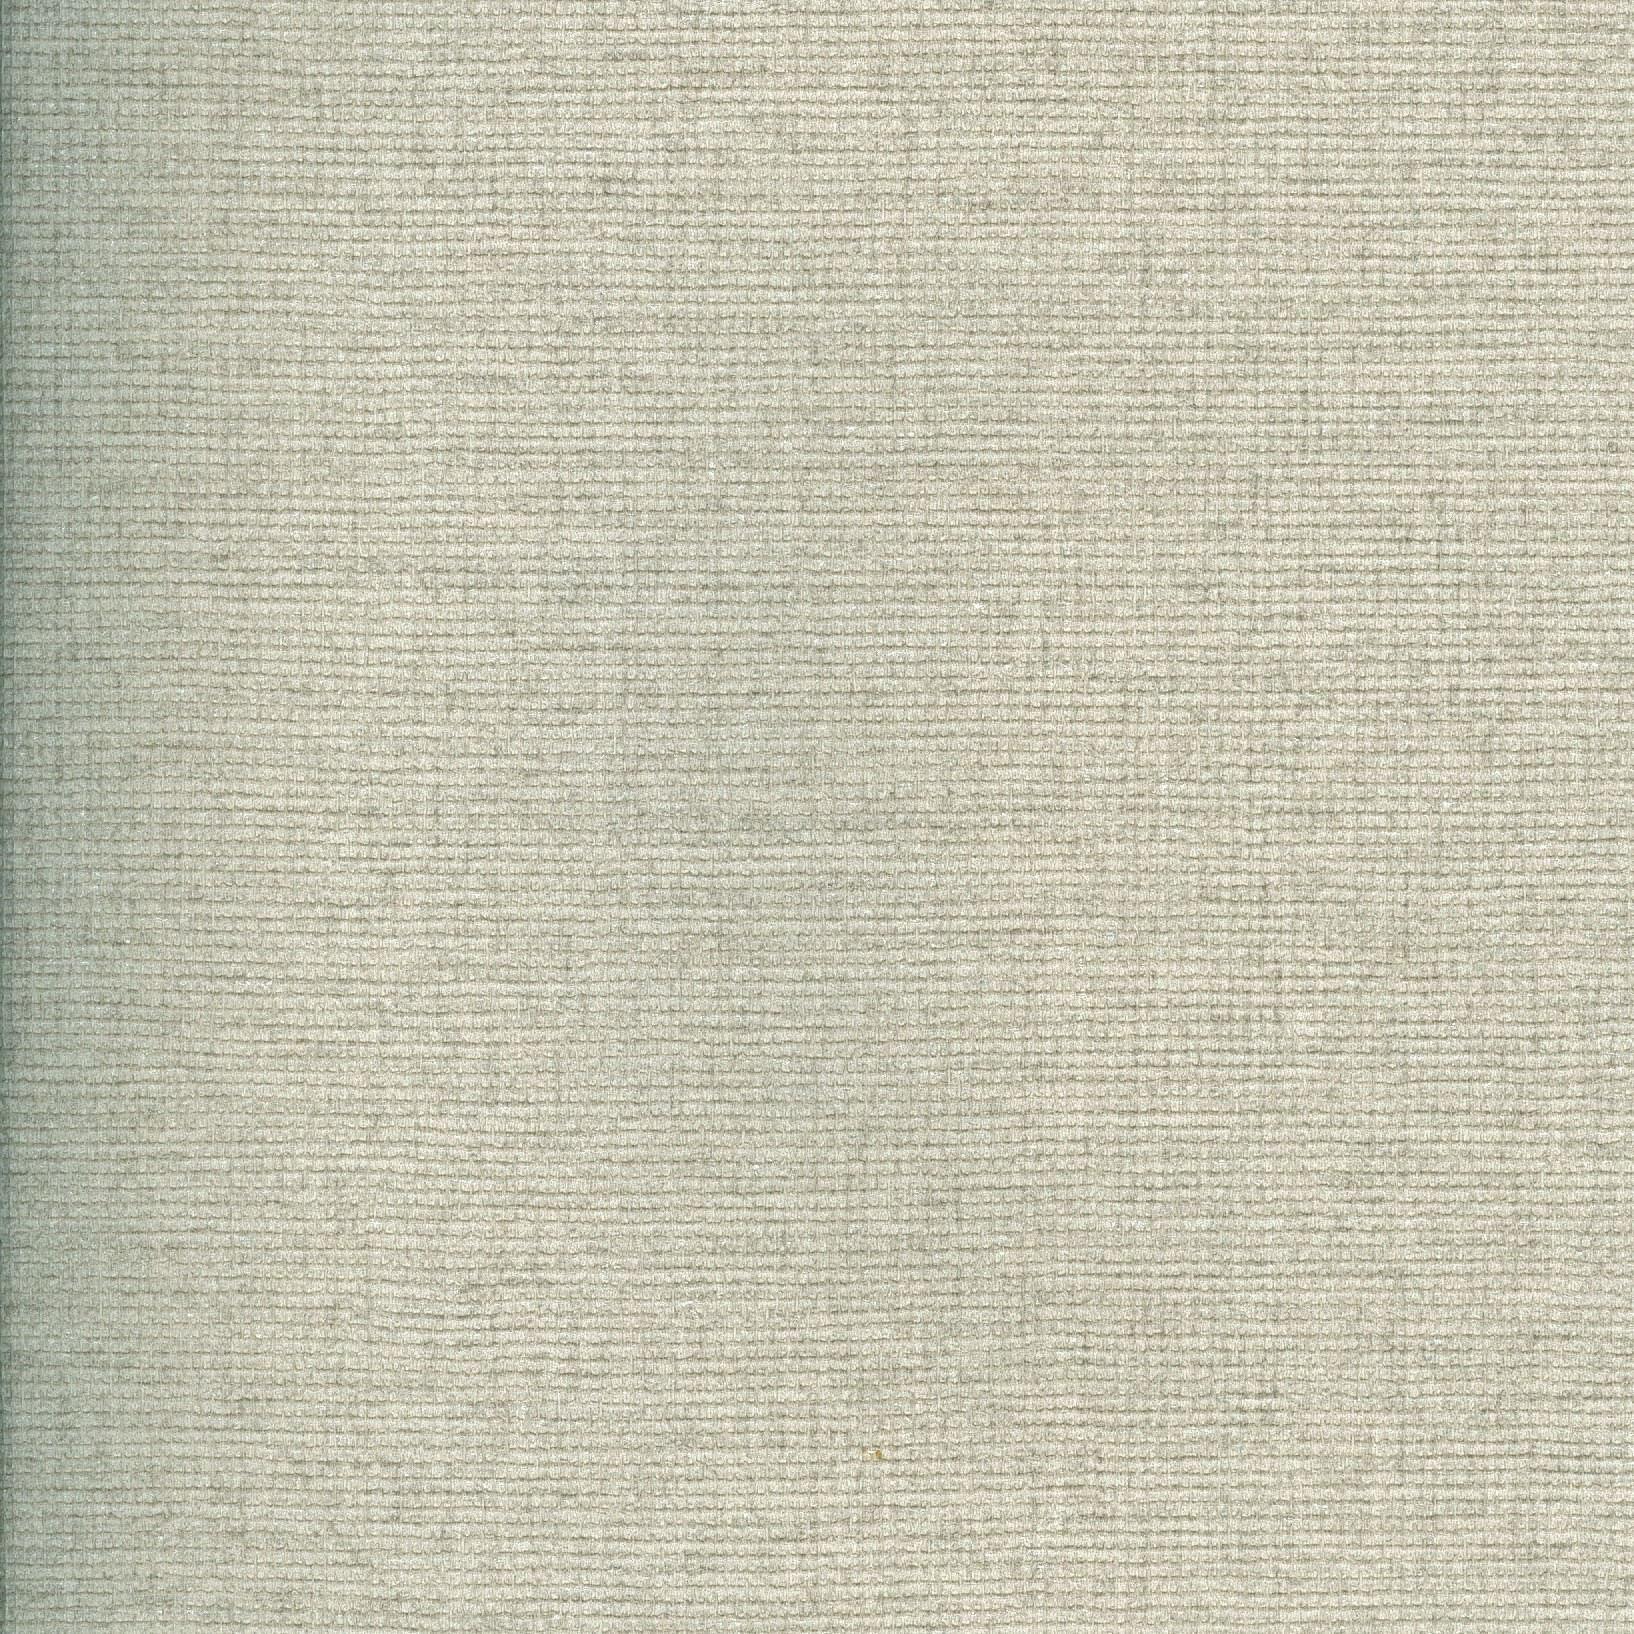 Papel de Parede Pure 2 Tramado 187112 - Rolo: 10m x 0,53m